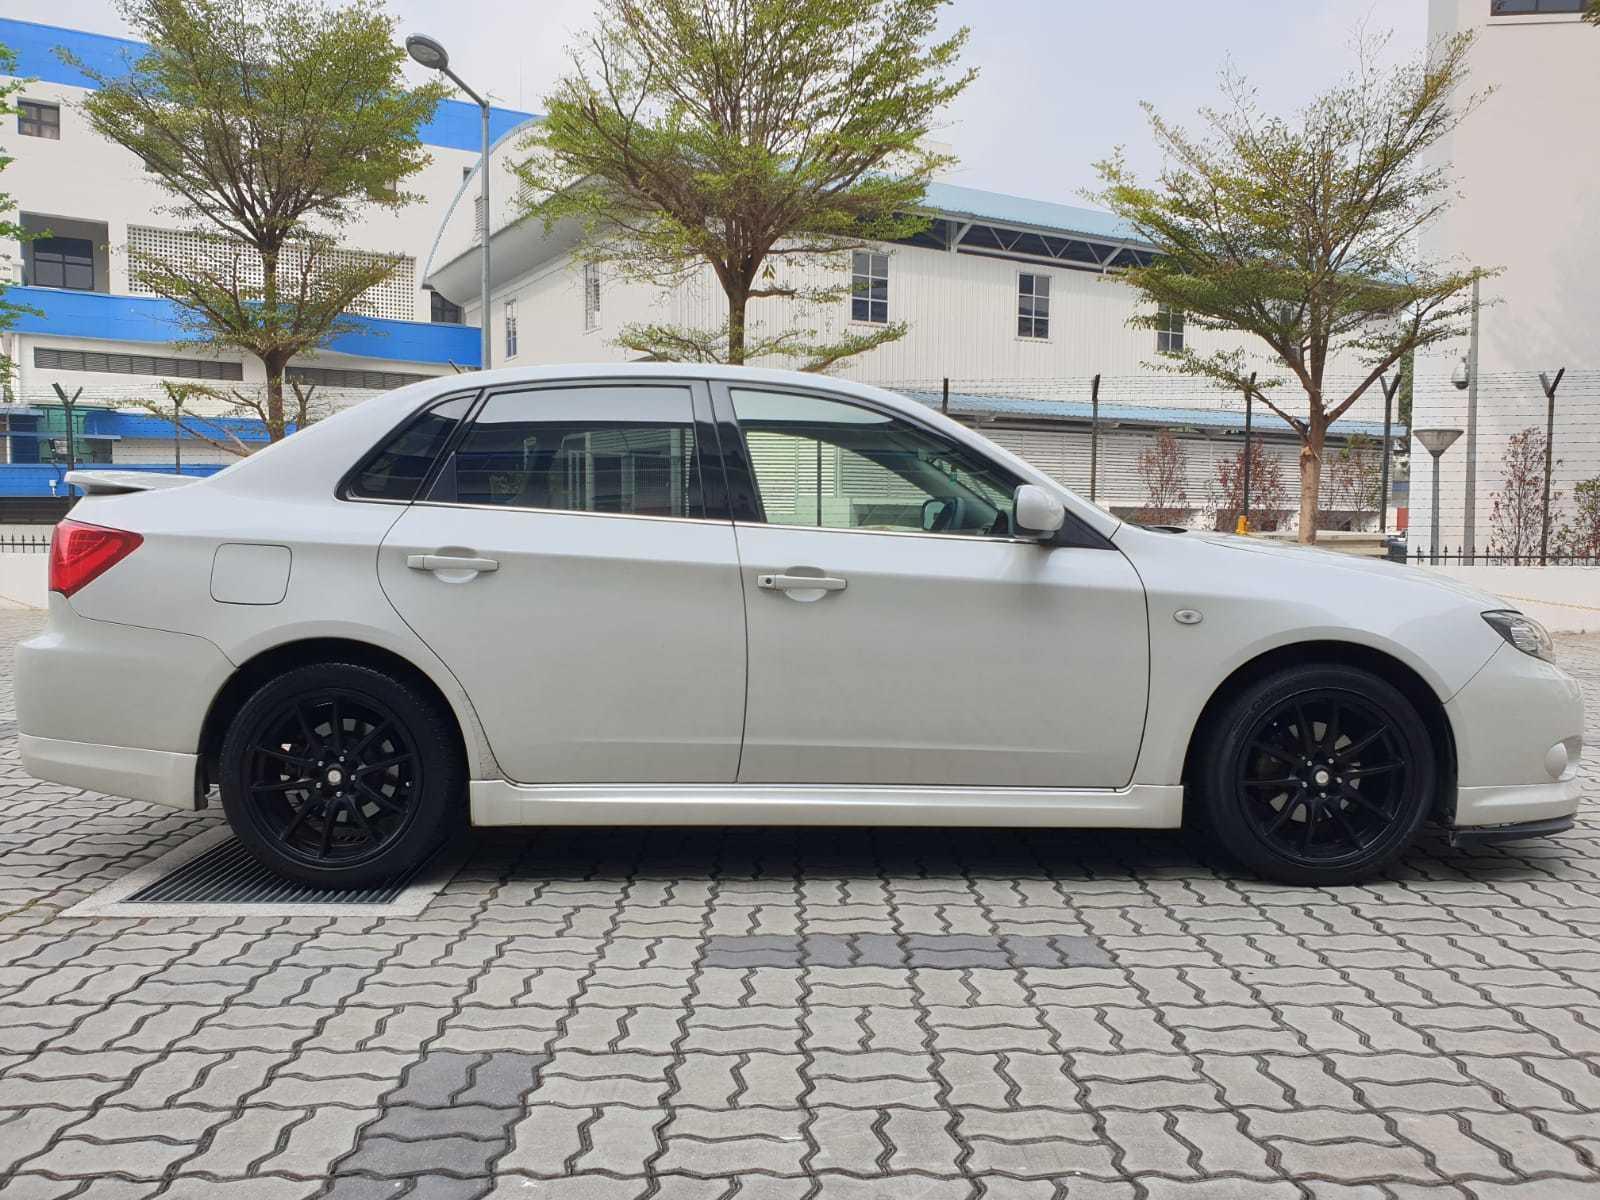 Subaru Impreza 2.0 - Cheapest rental in city, quickest assistance!